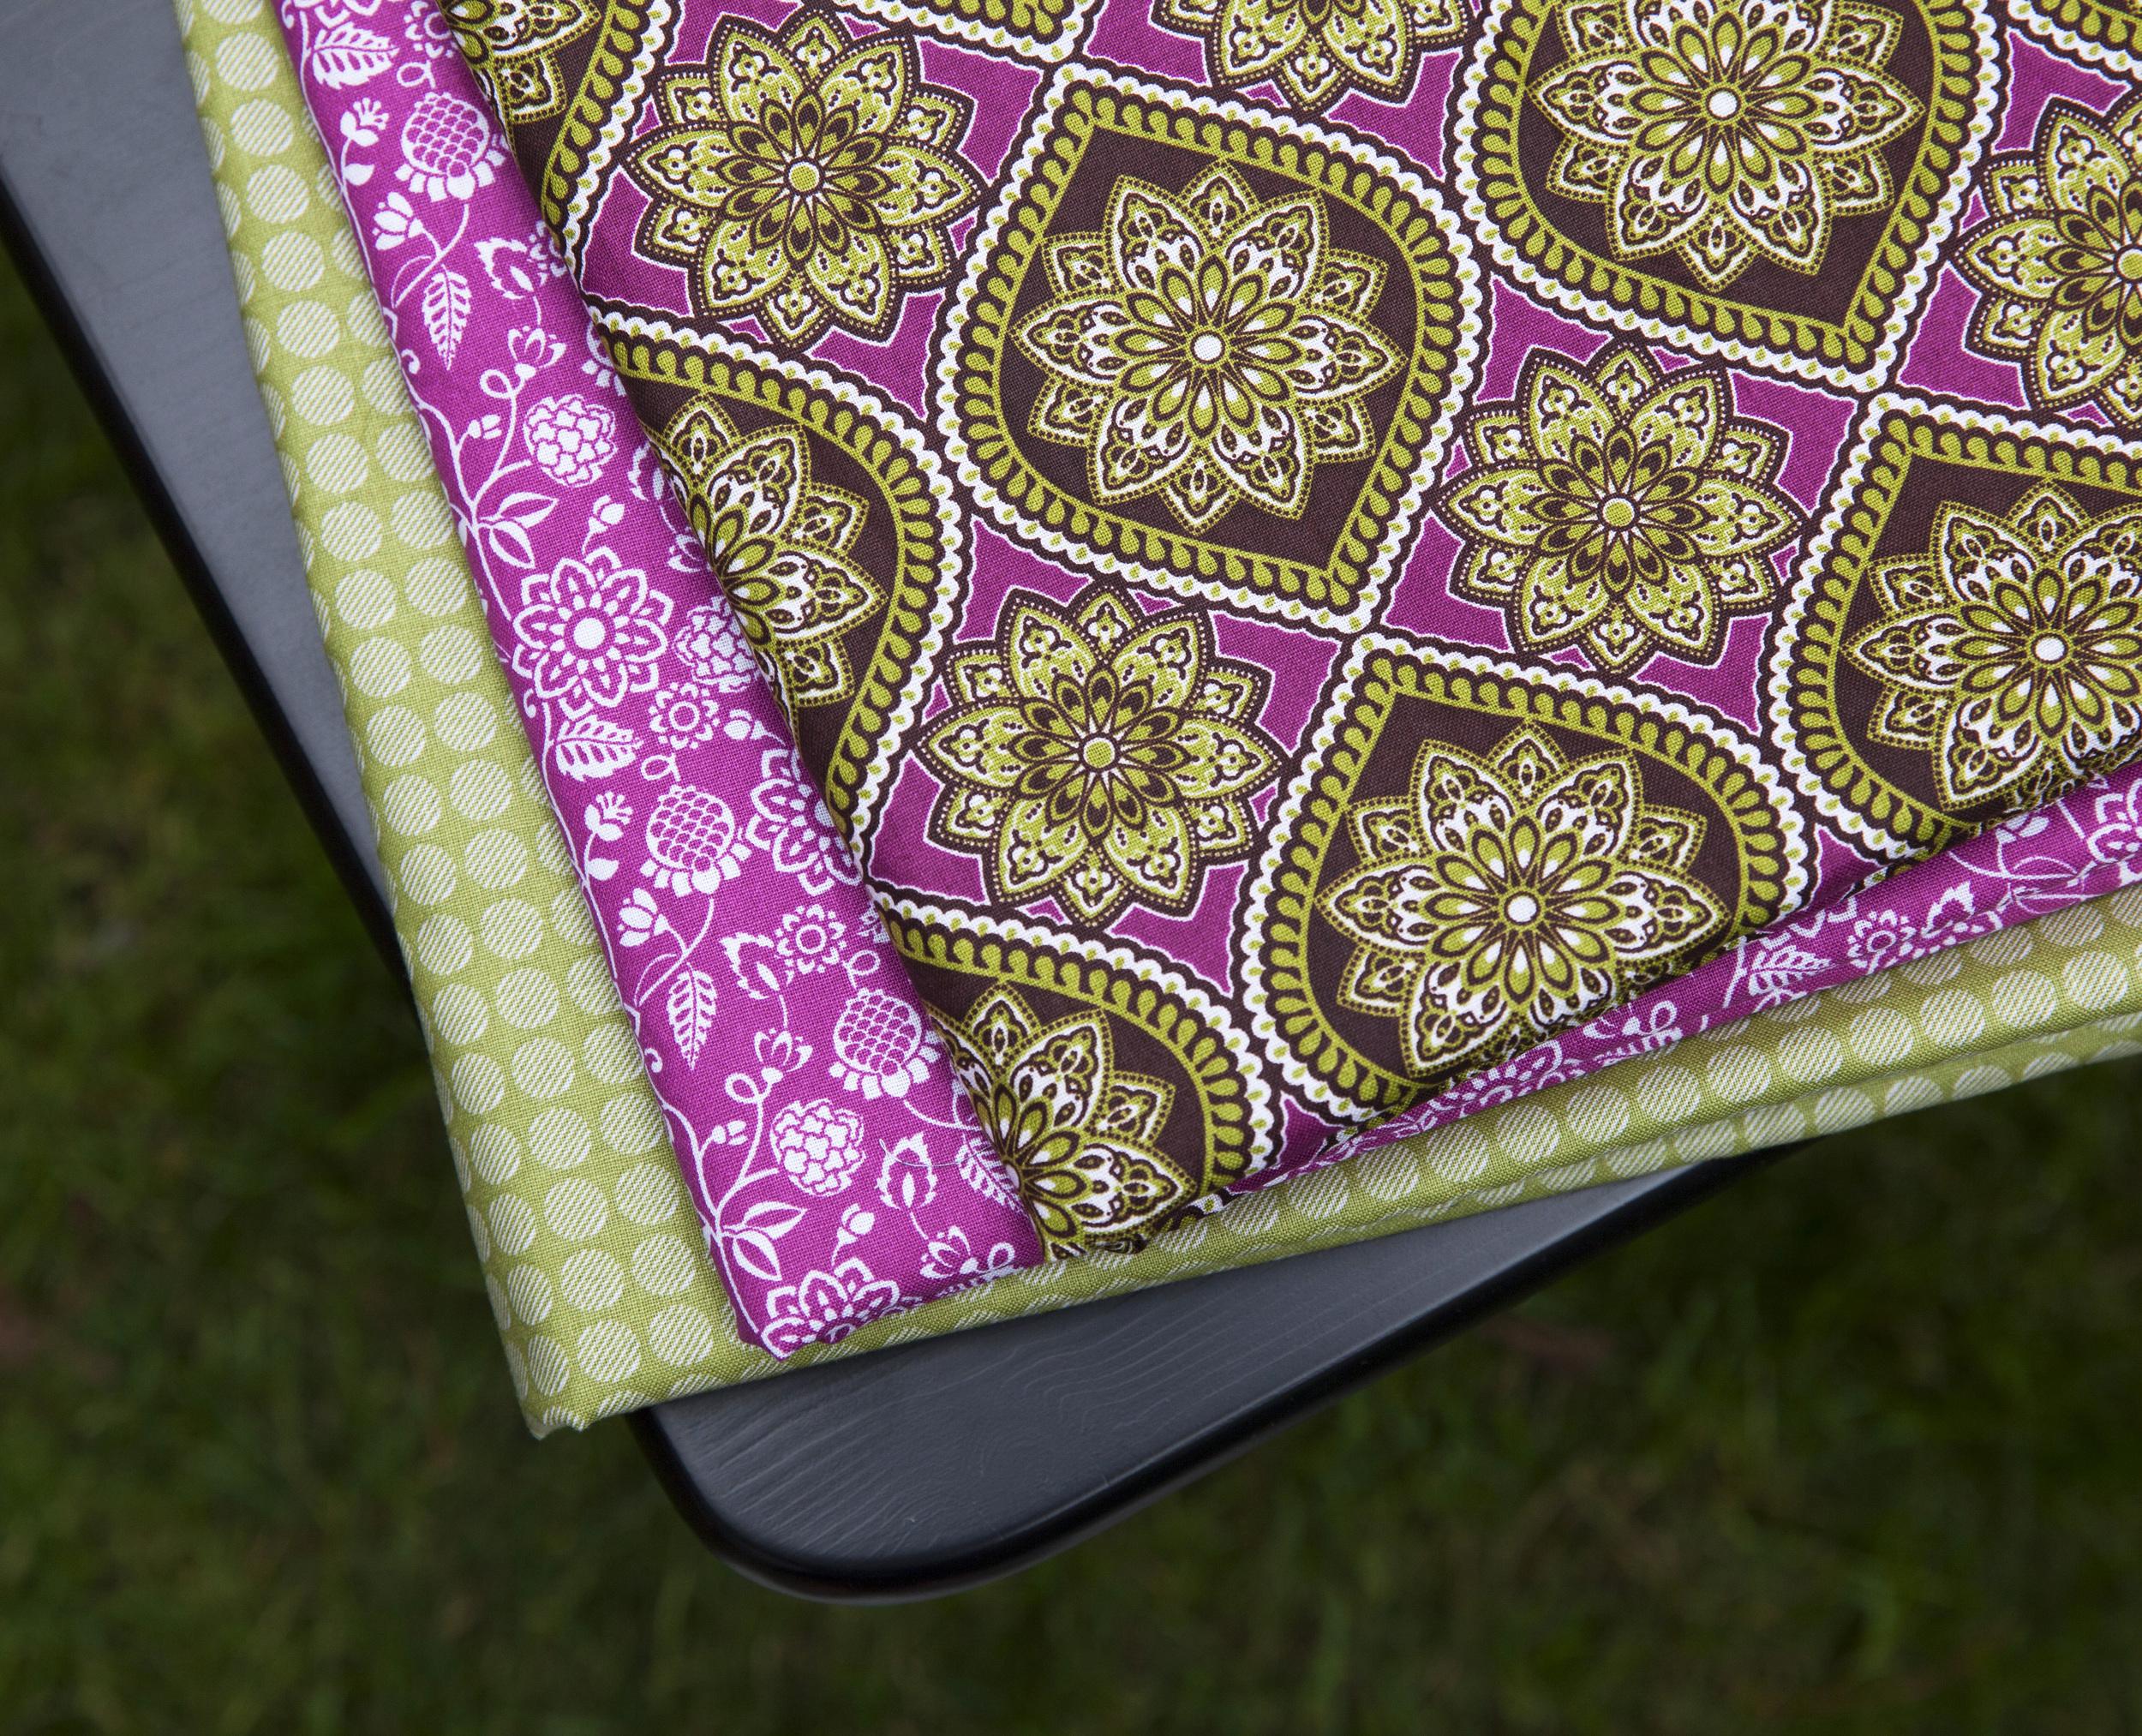 David Textiles + Diane Kappa Designs